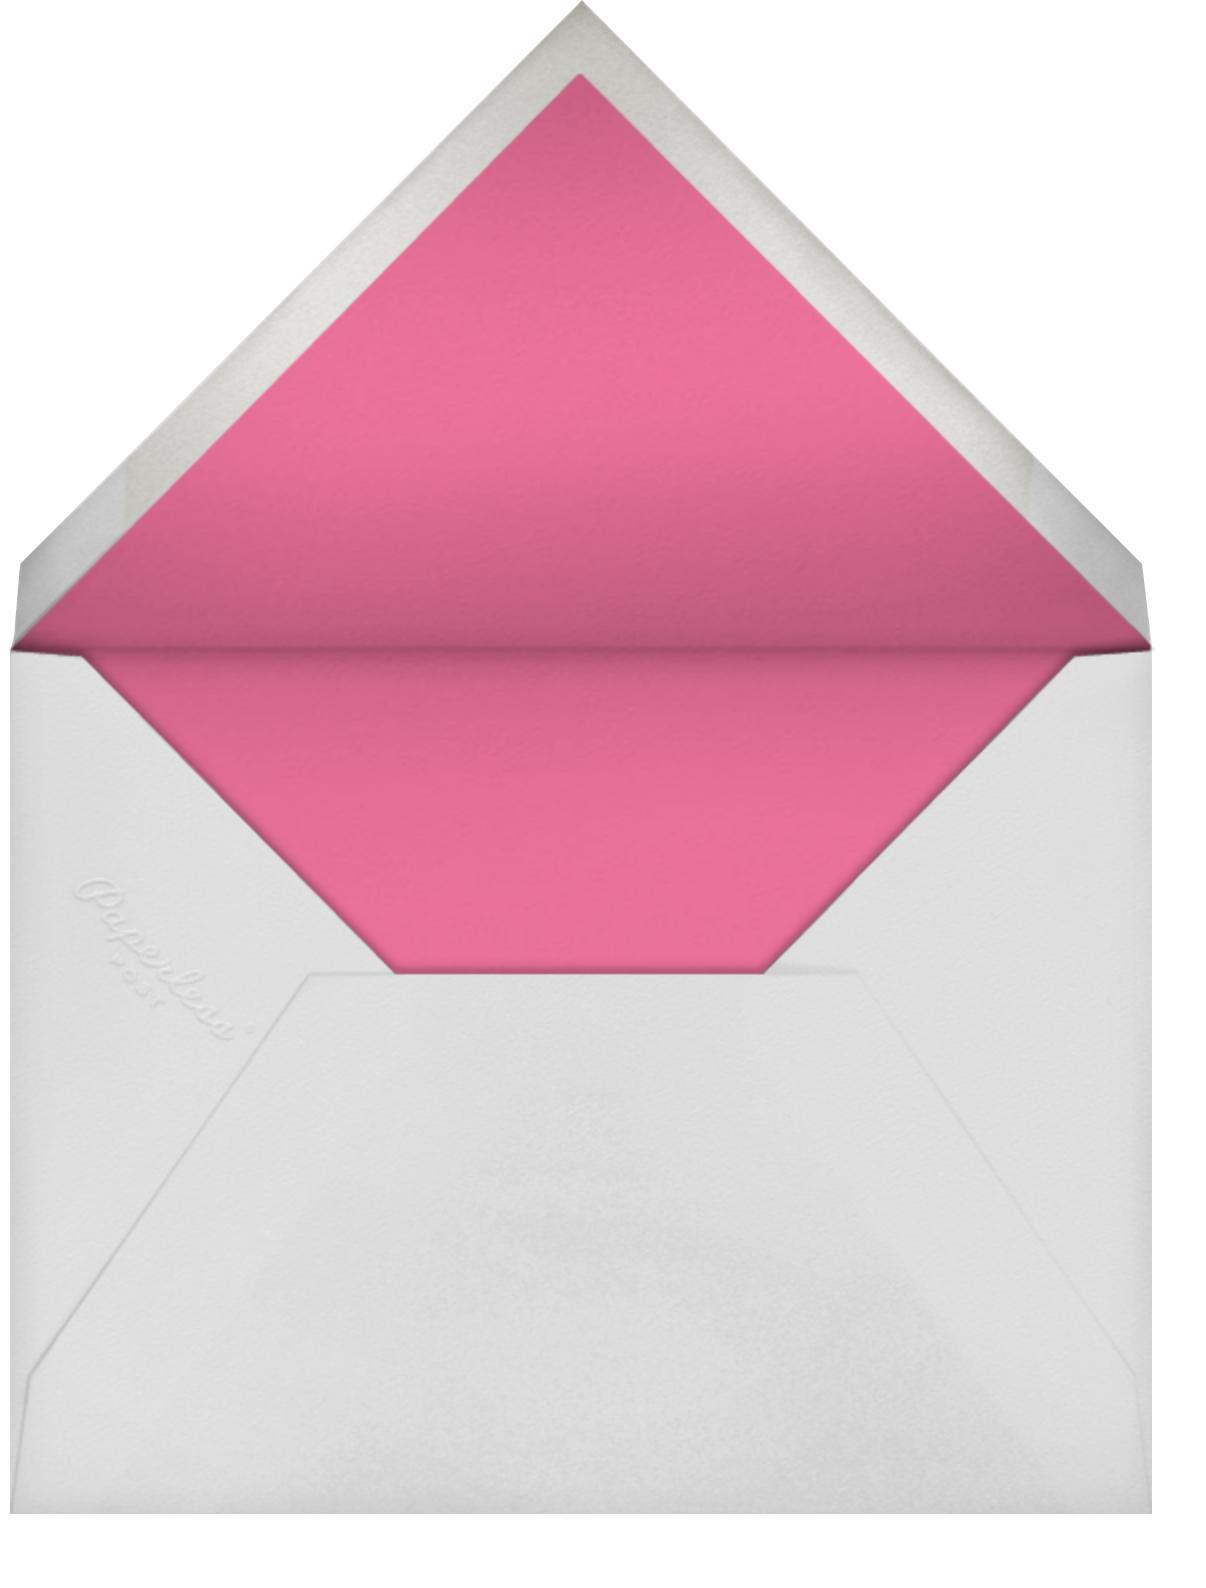 Llama Llama - Gray Malin - Kids' birthday - envelope back